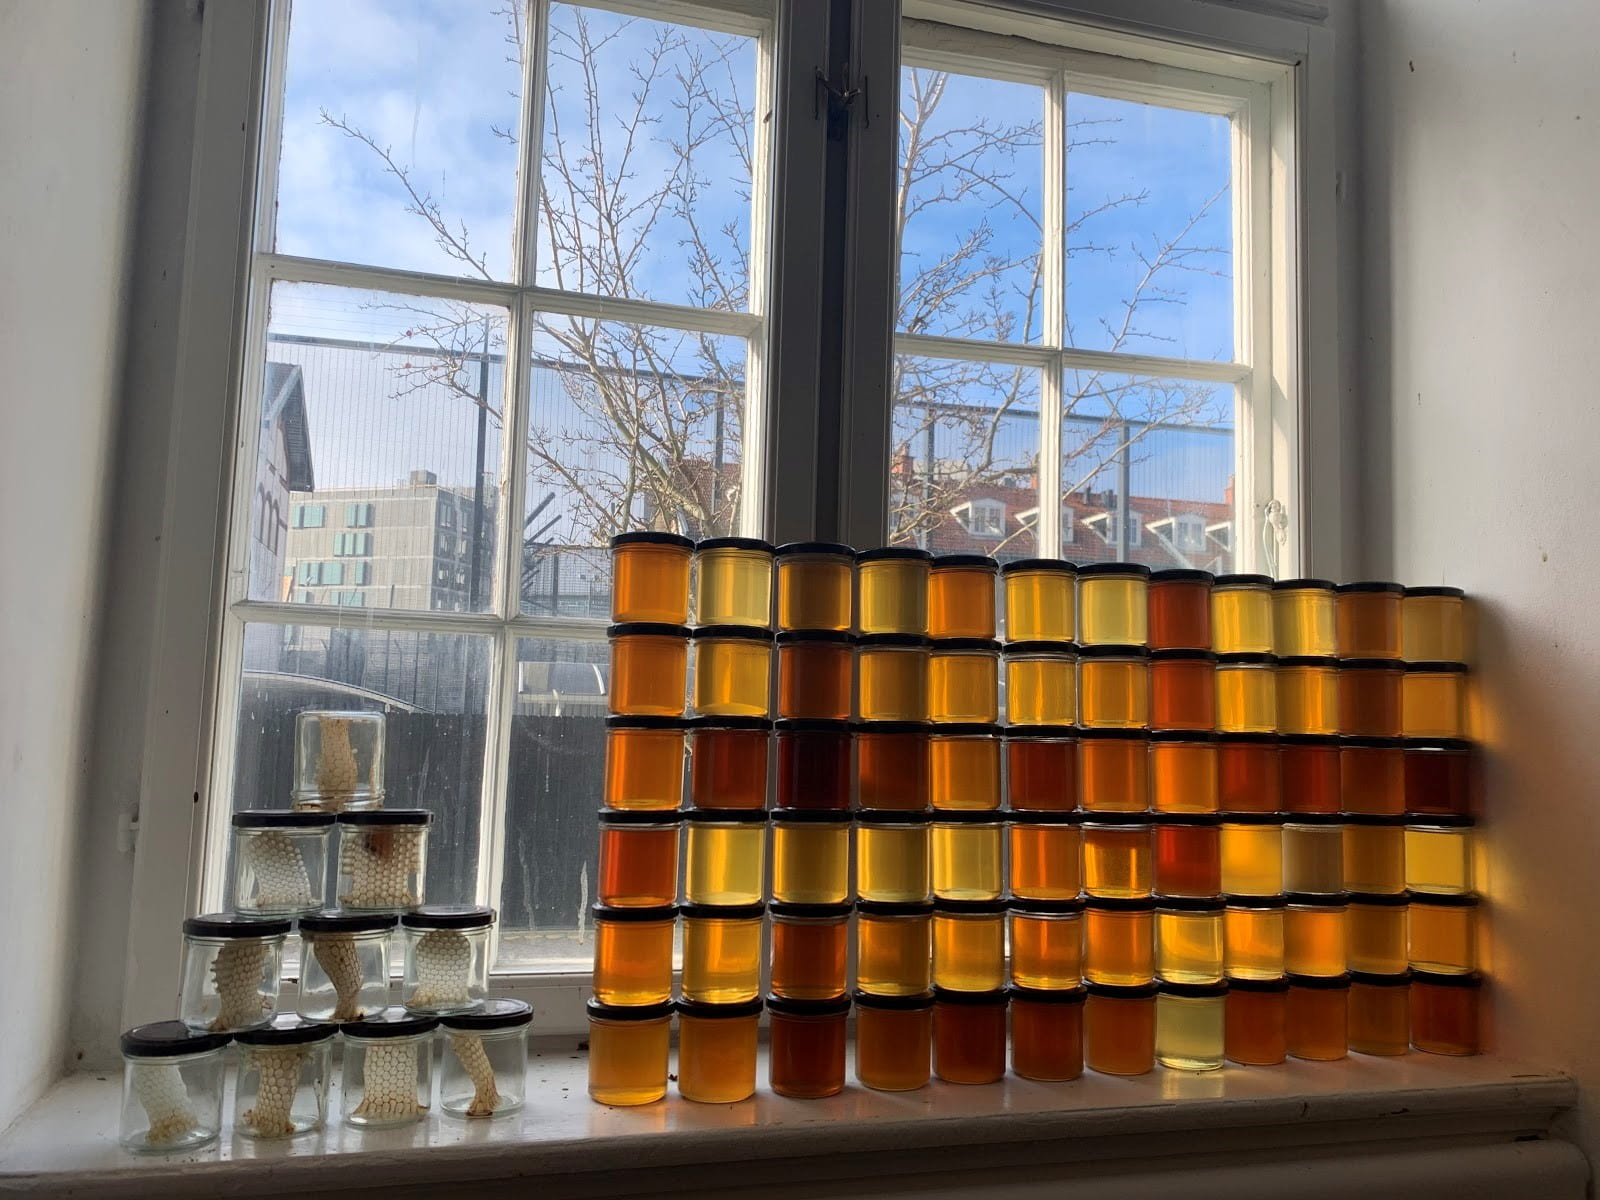 Jars of honey stacked on a windowsill